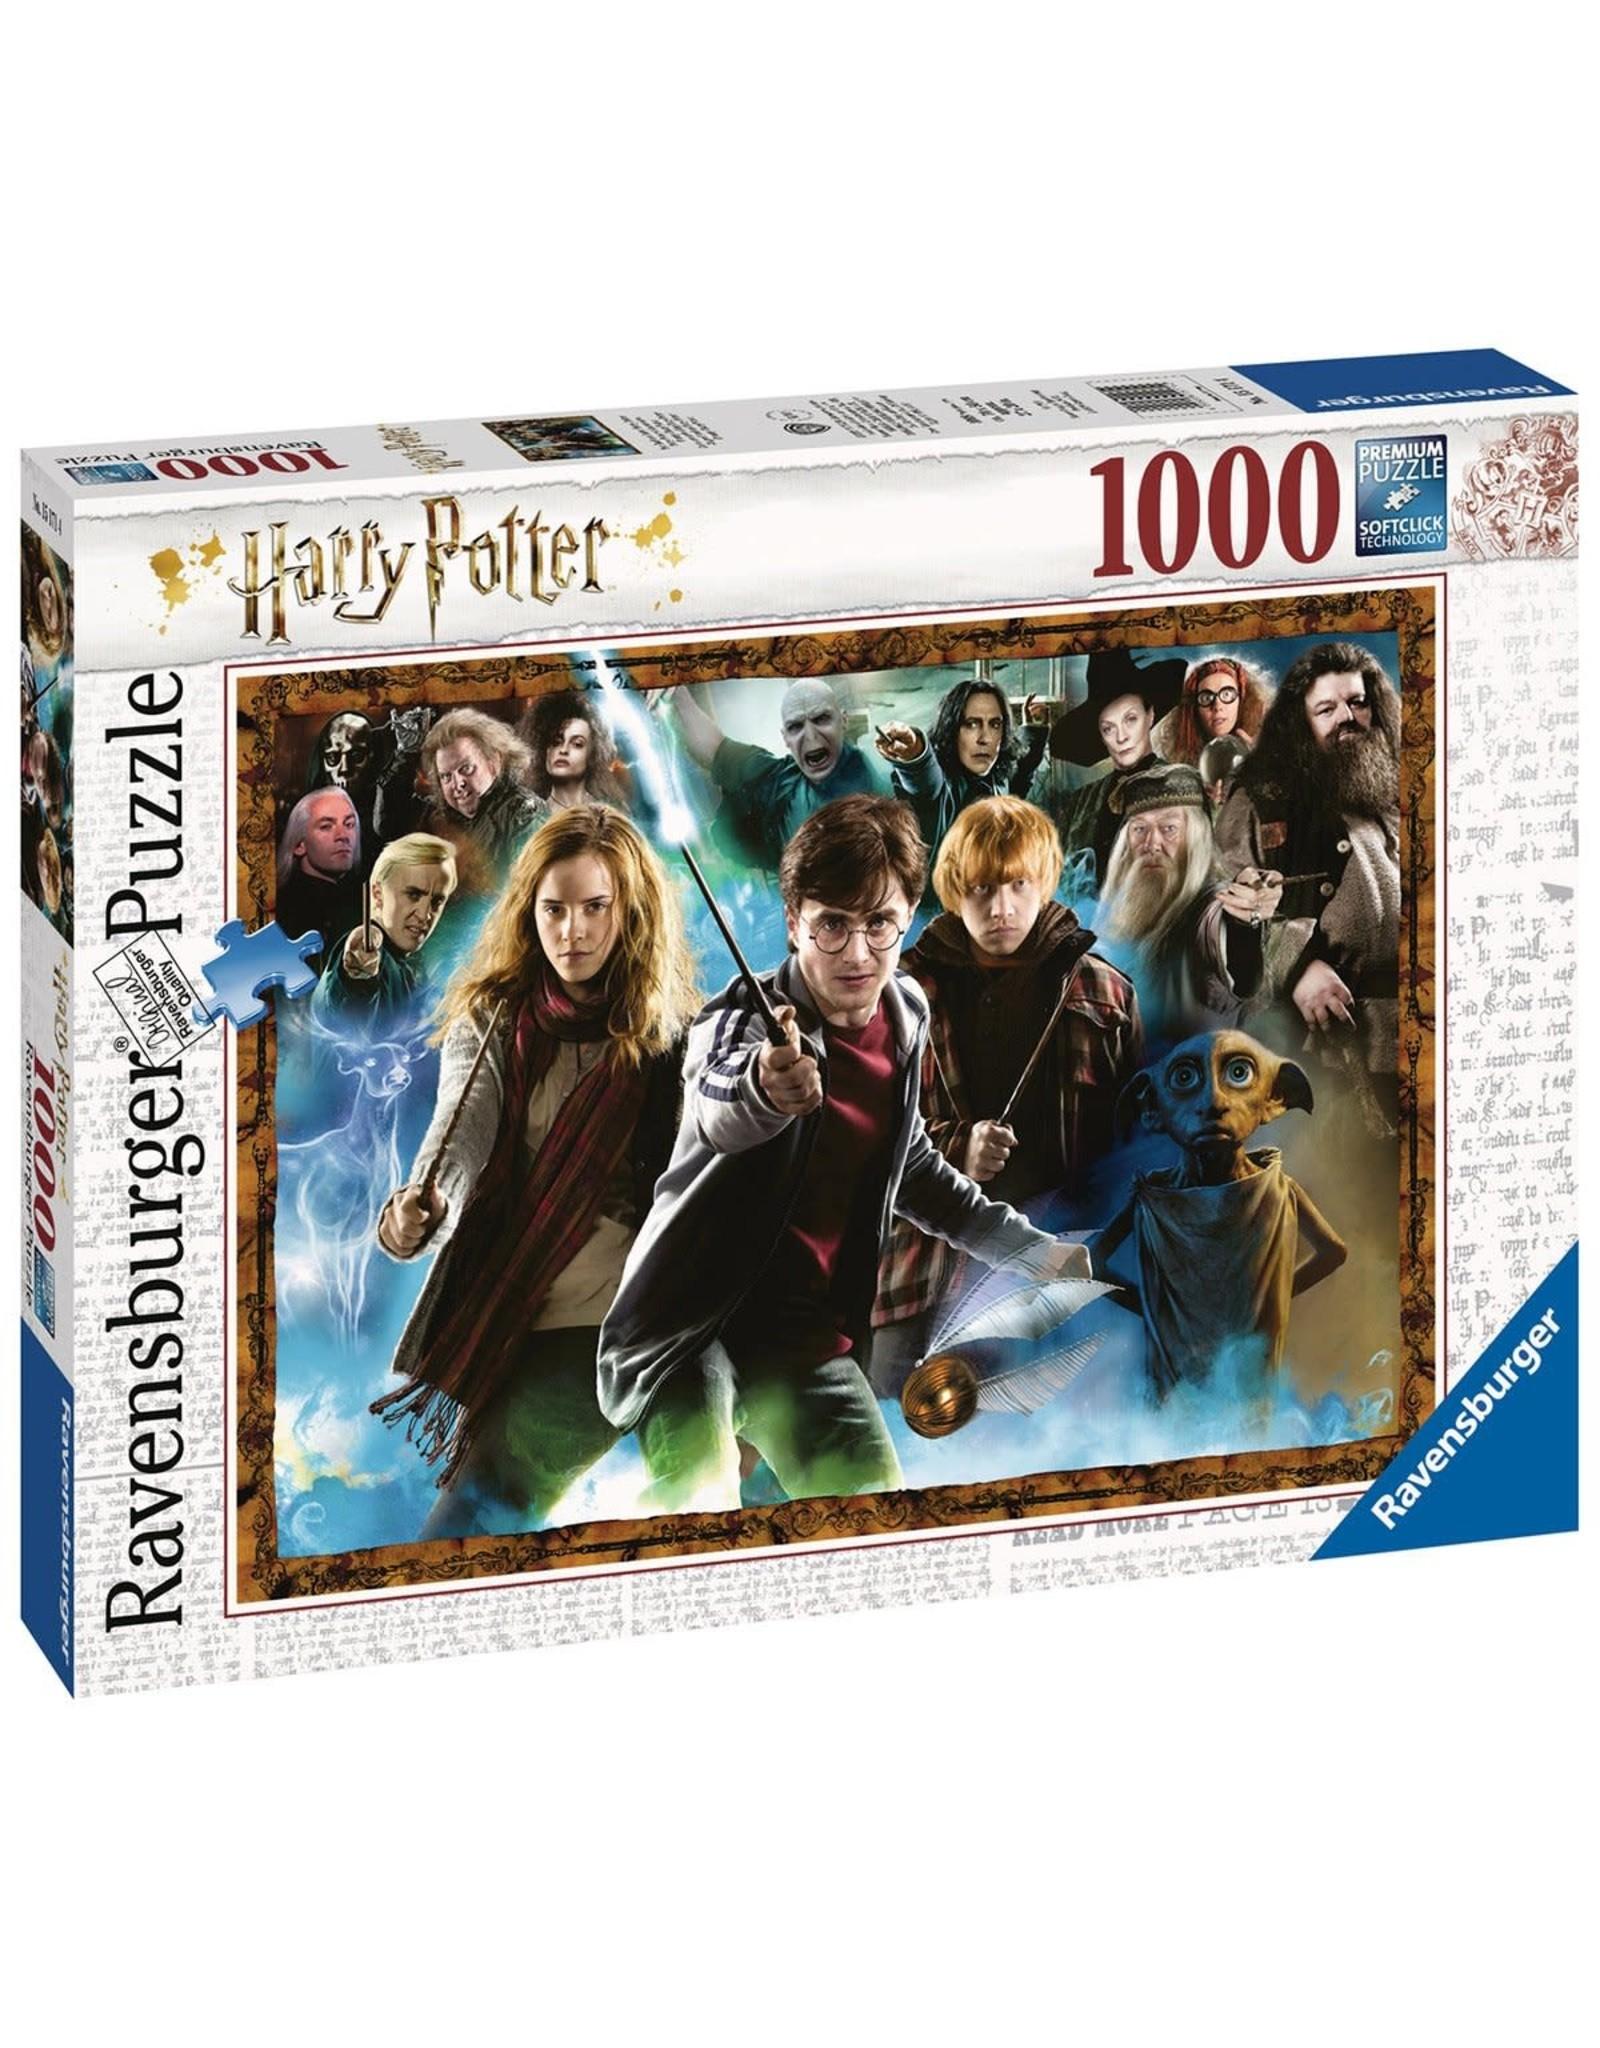 Ravensburger HARRY POTTER Puzzle 1000P - Magical Student